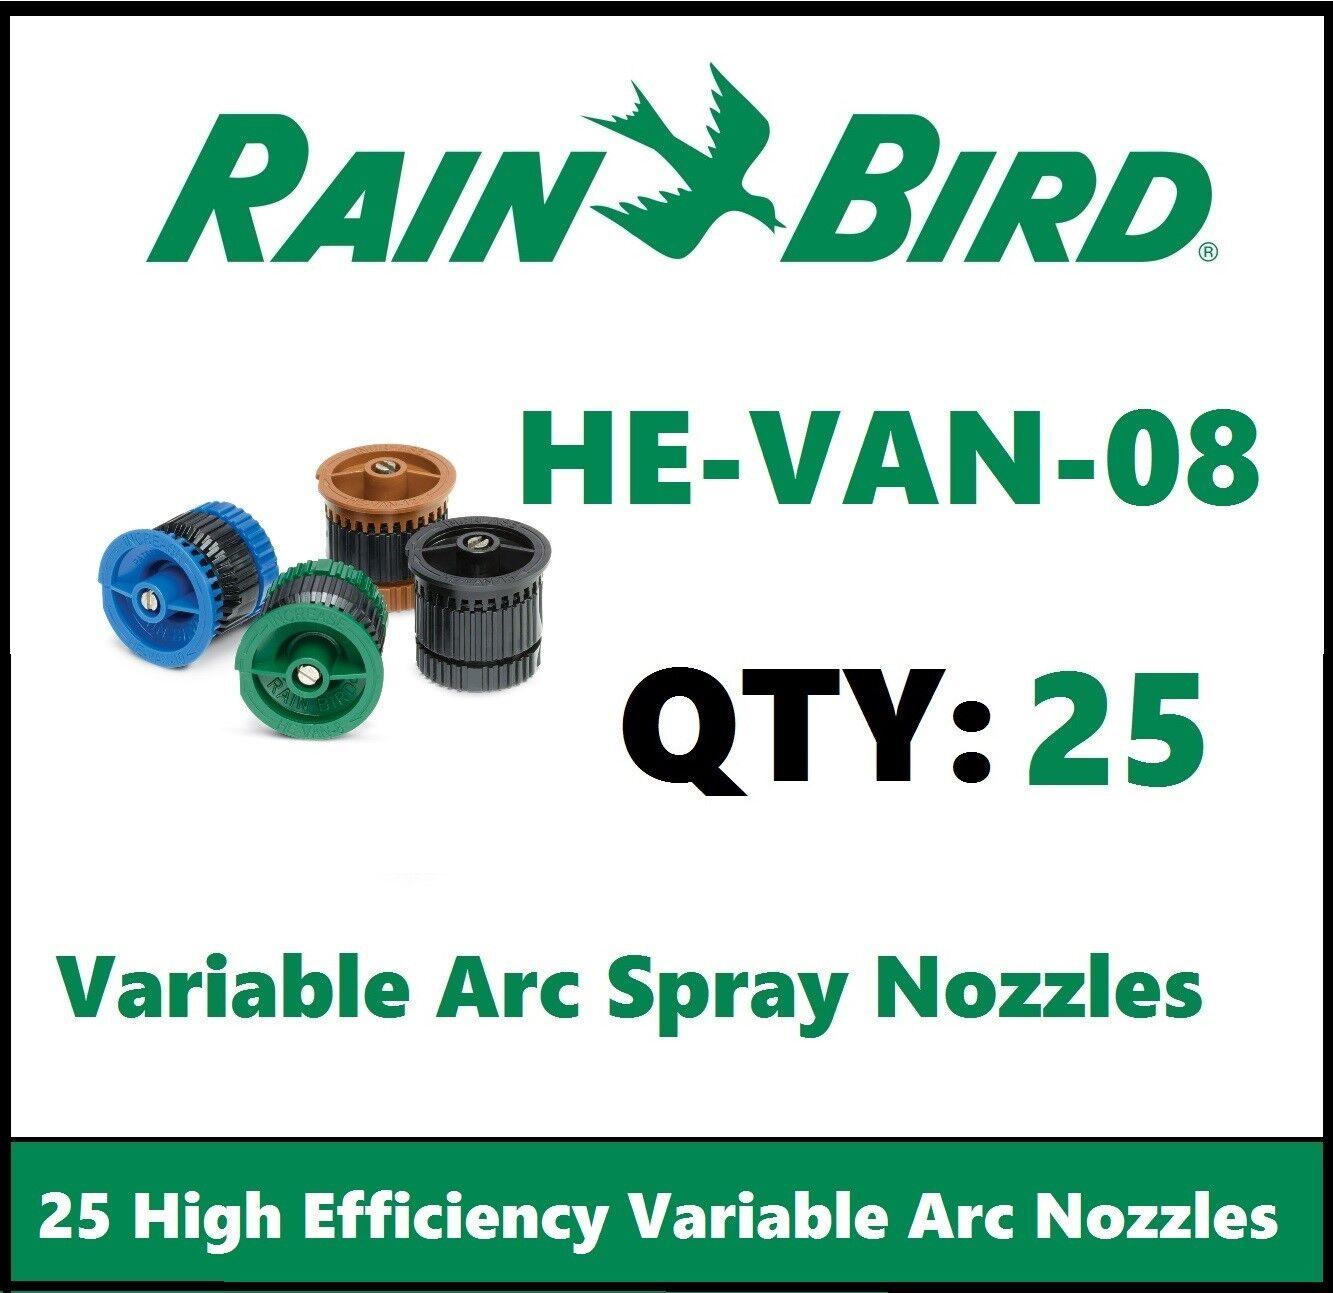 Rain Bird HE-VAN-12 High Efficiency Variable Adjustable Arc Nozzles 12 ft 0-360°